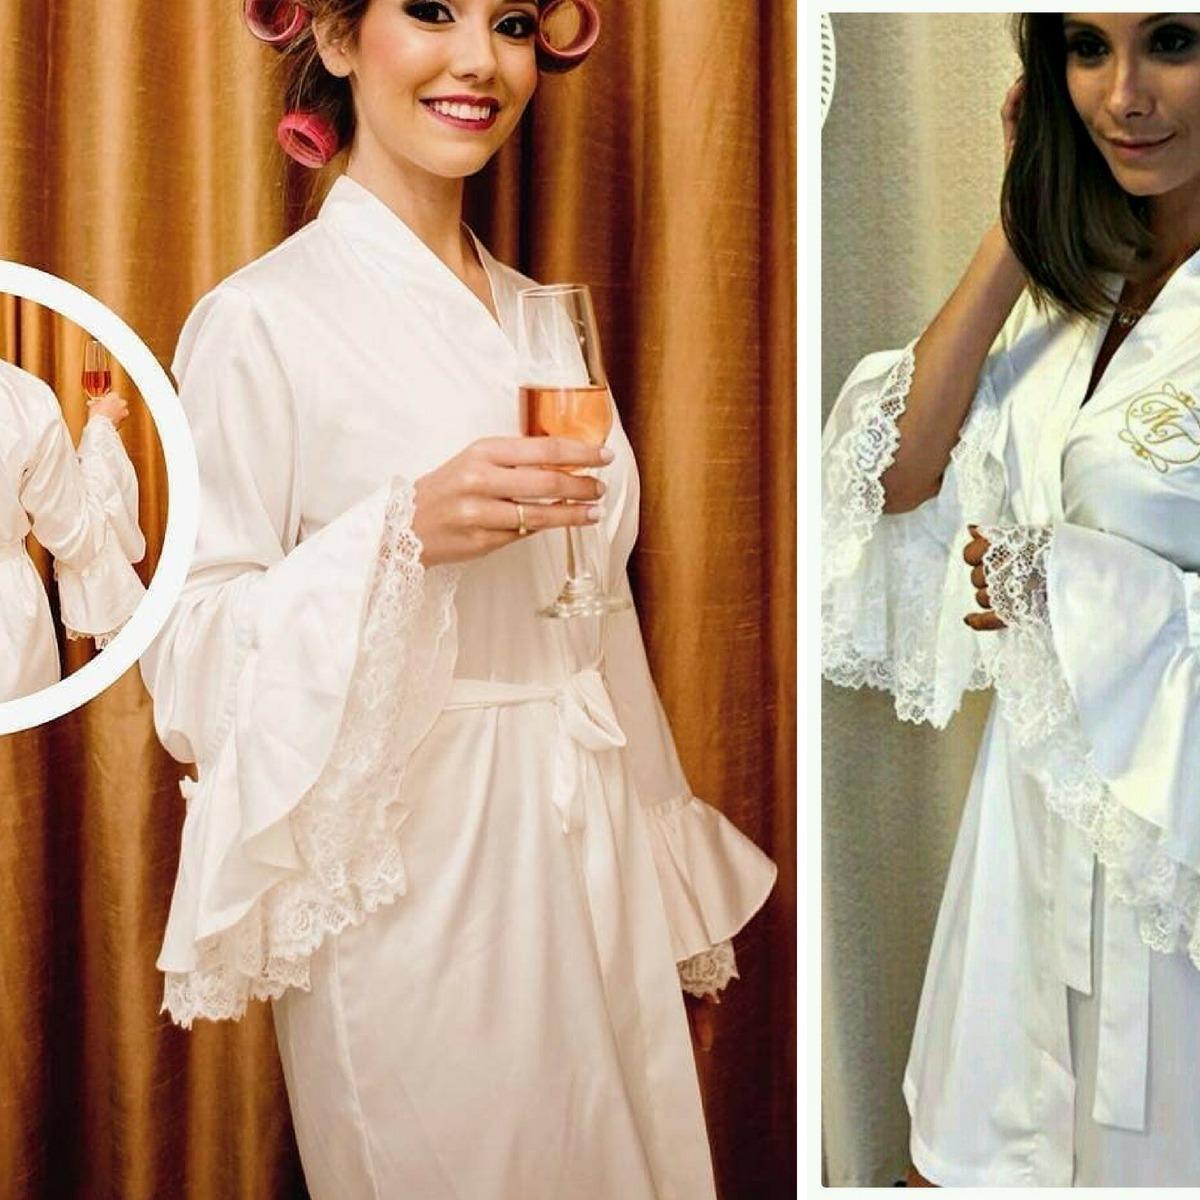 6f868e7c2 robi luxo roupao cetim robby robe noiva roby hoby casamento. Carregando  zoom.